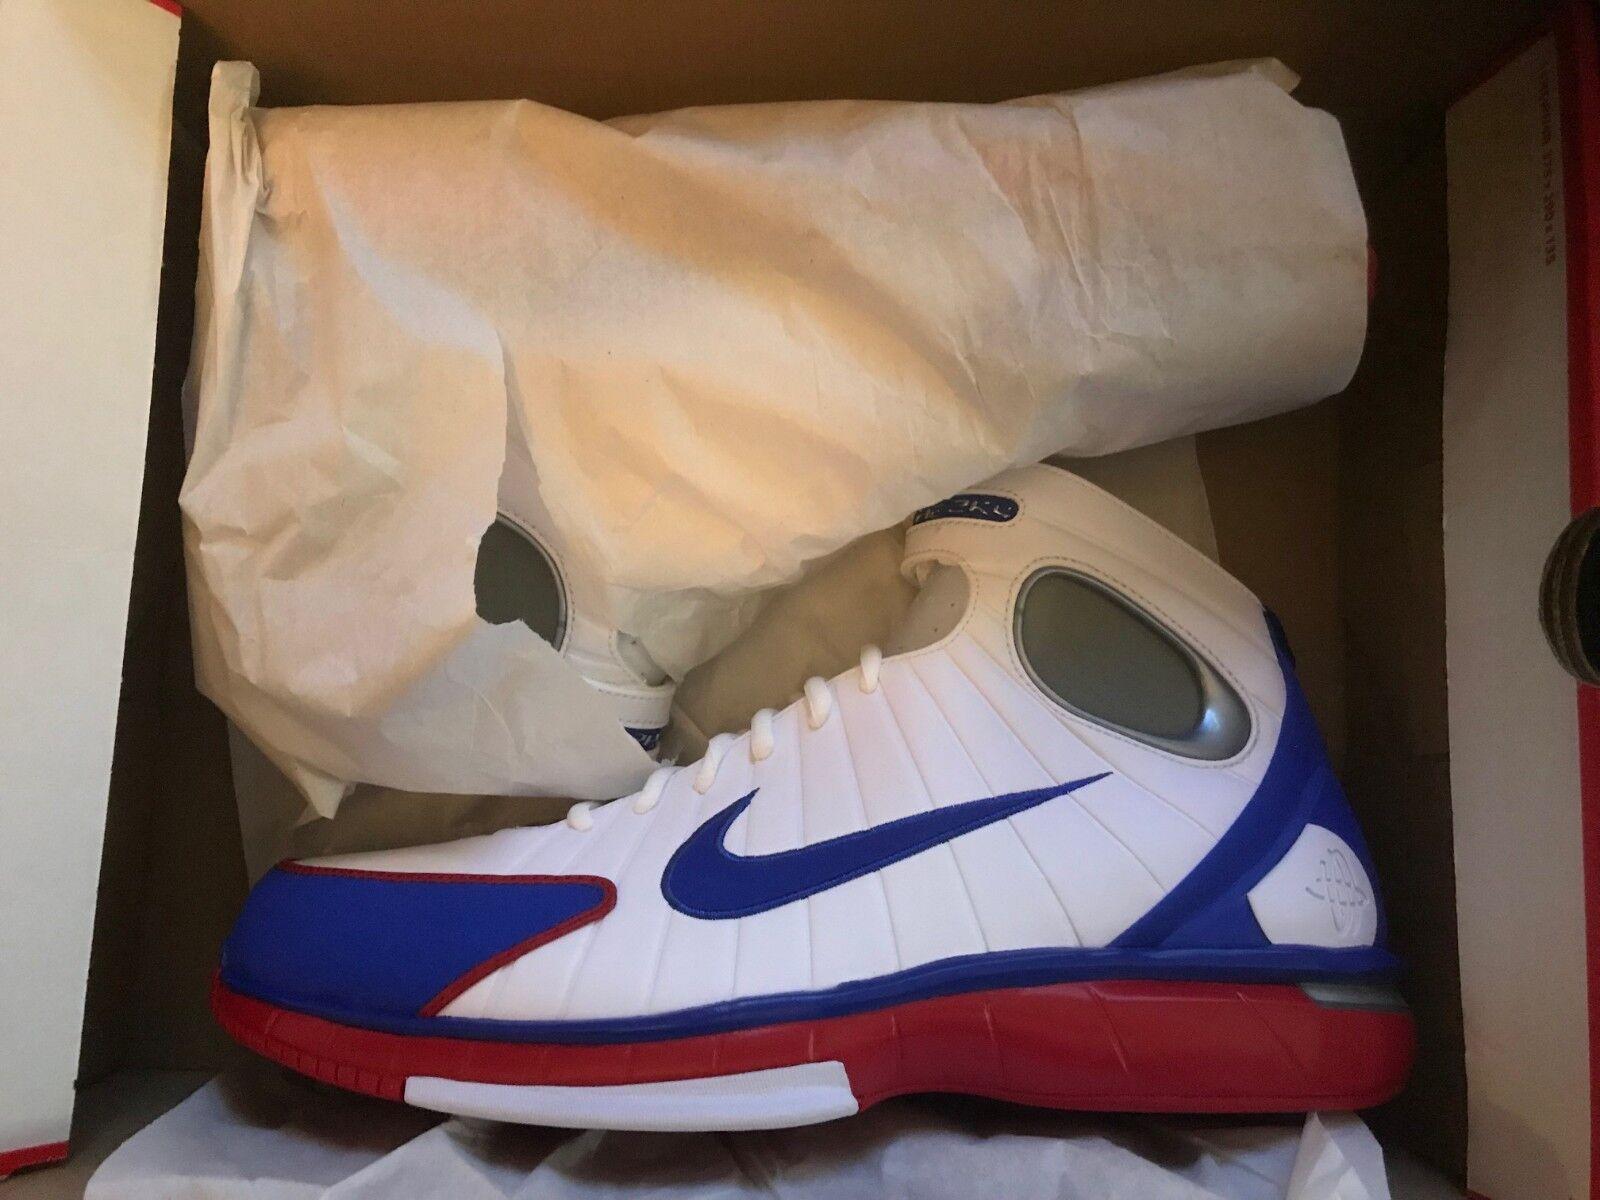 Nike air zoom huarache 2k4 white red royal size 13 new